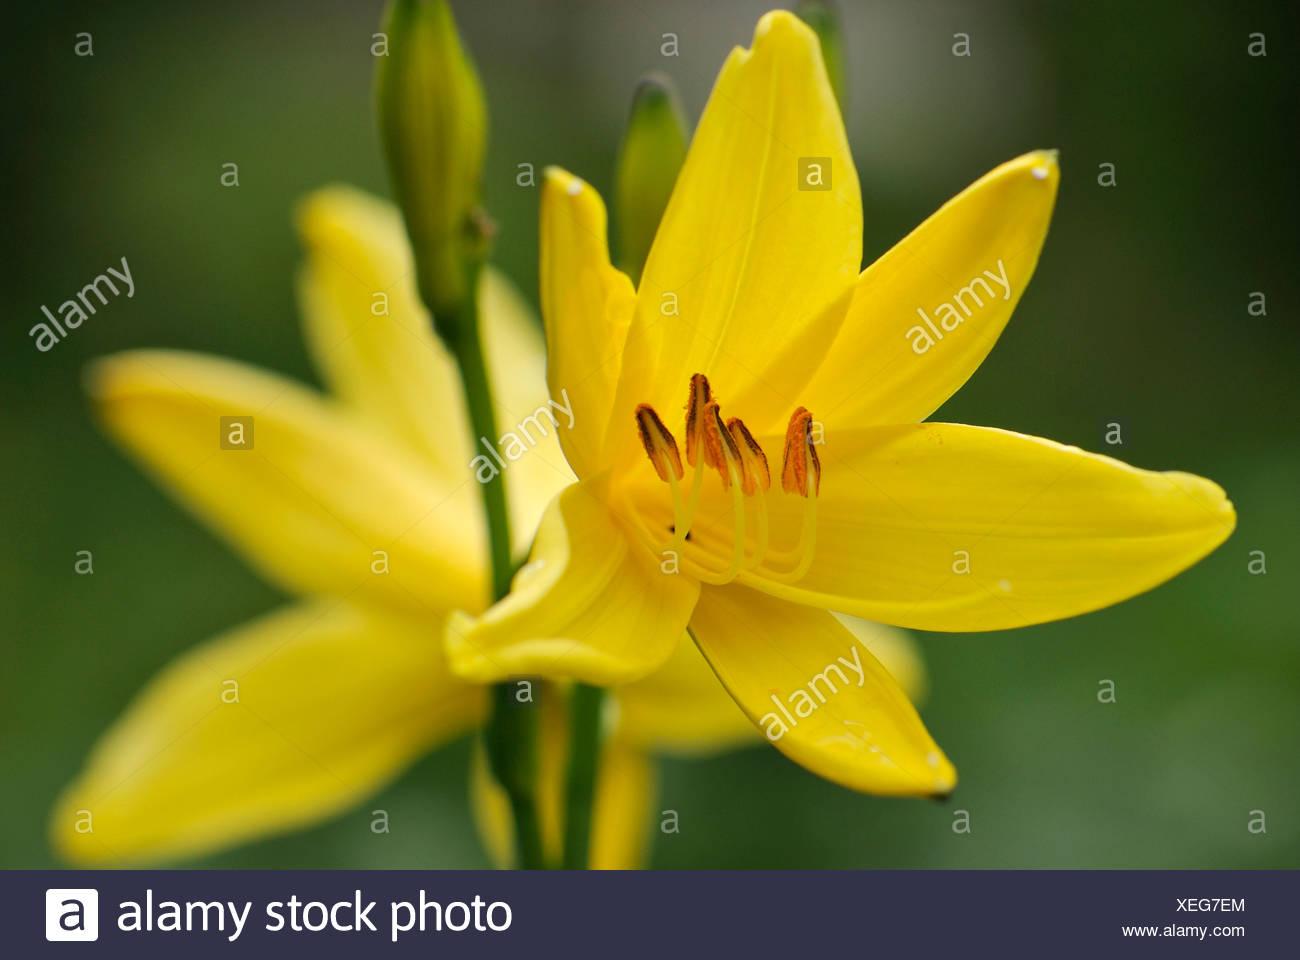 Yellow Day Lilies (Hemerocallis), Fischbachau, Upper Bavaria, Germany, Europe - Stock Image